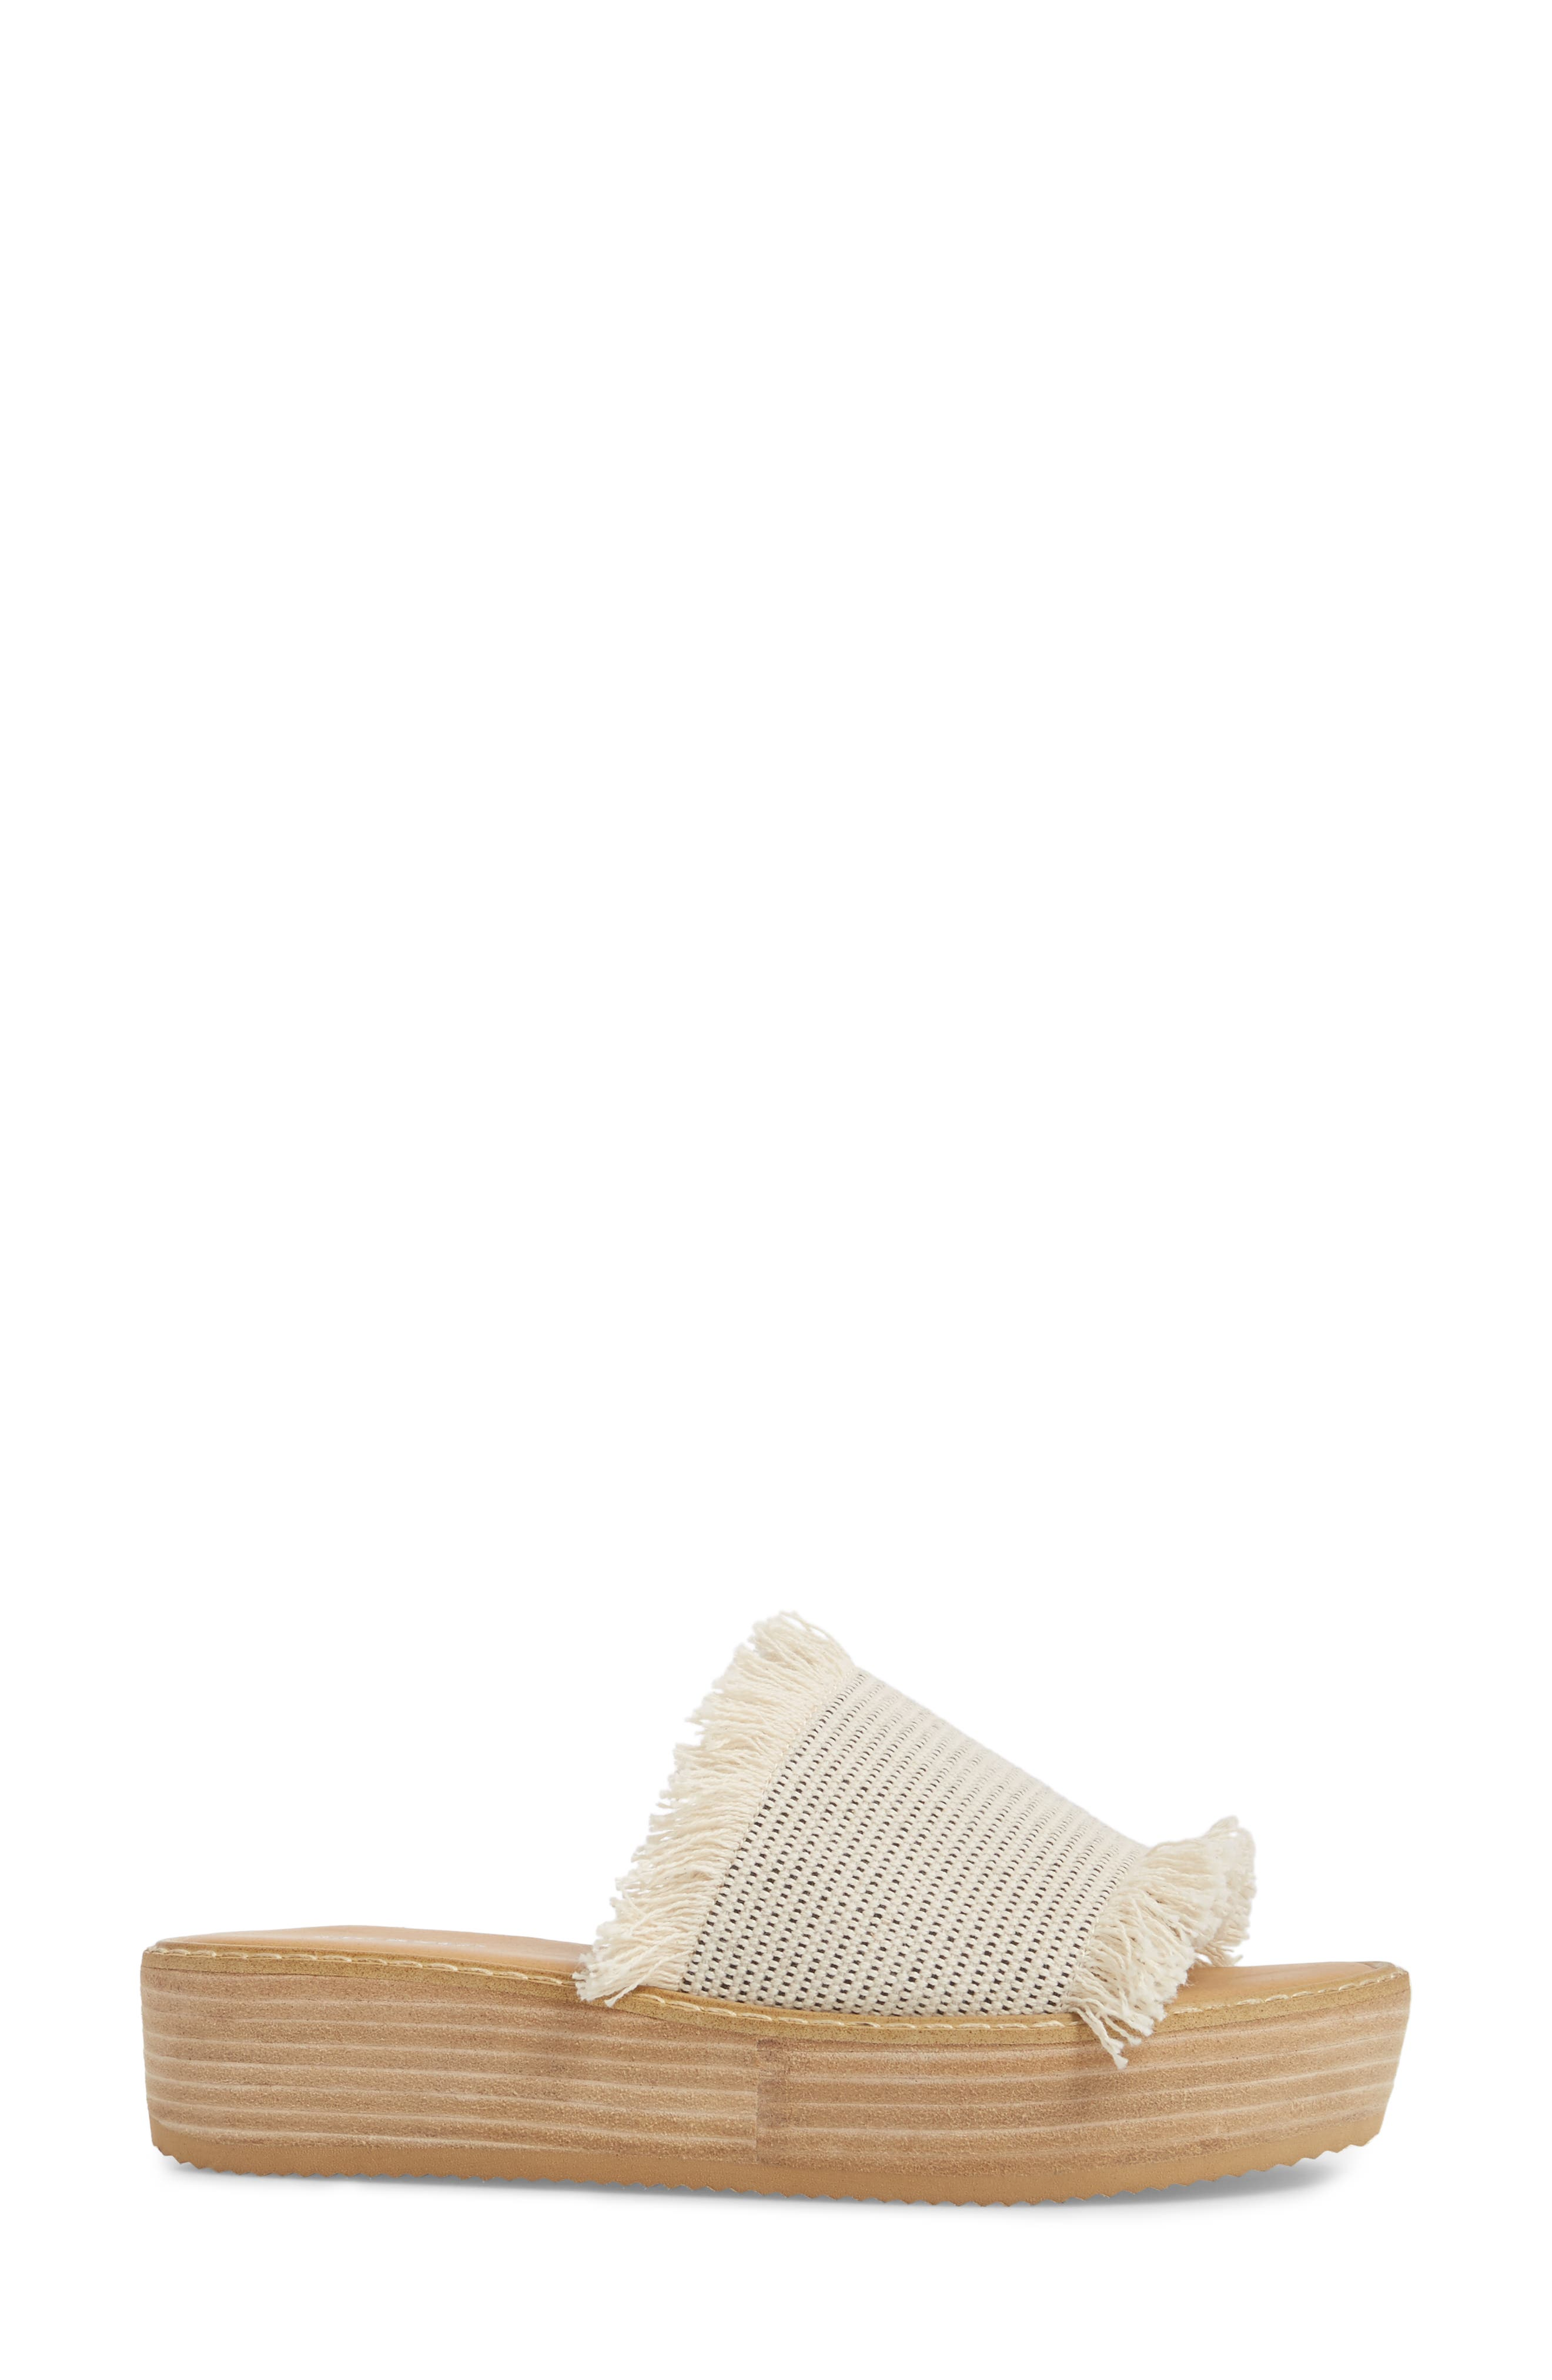 Ebony Platform Sandal,                             Alternate thumbnail 3, color,                             100